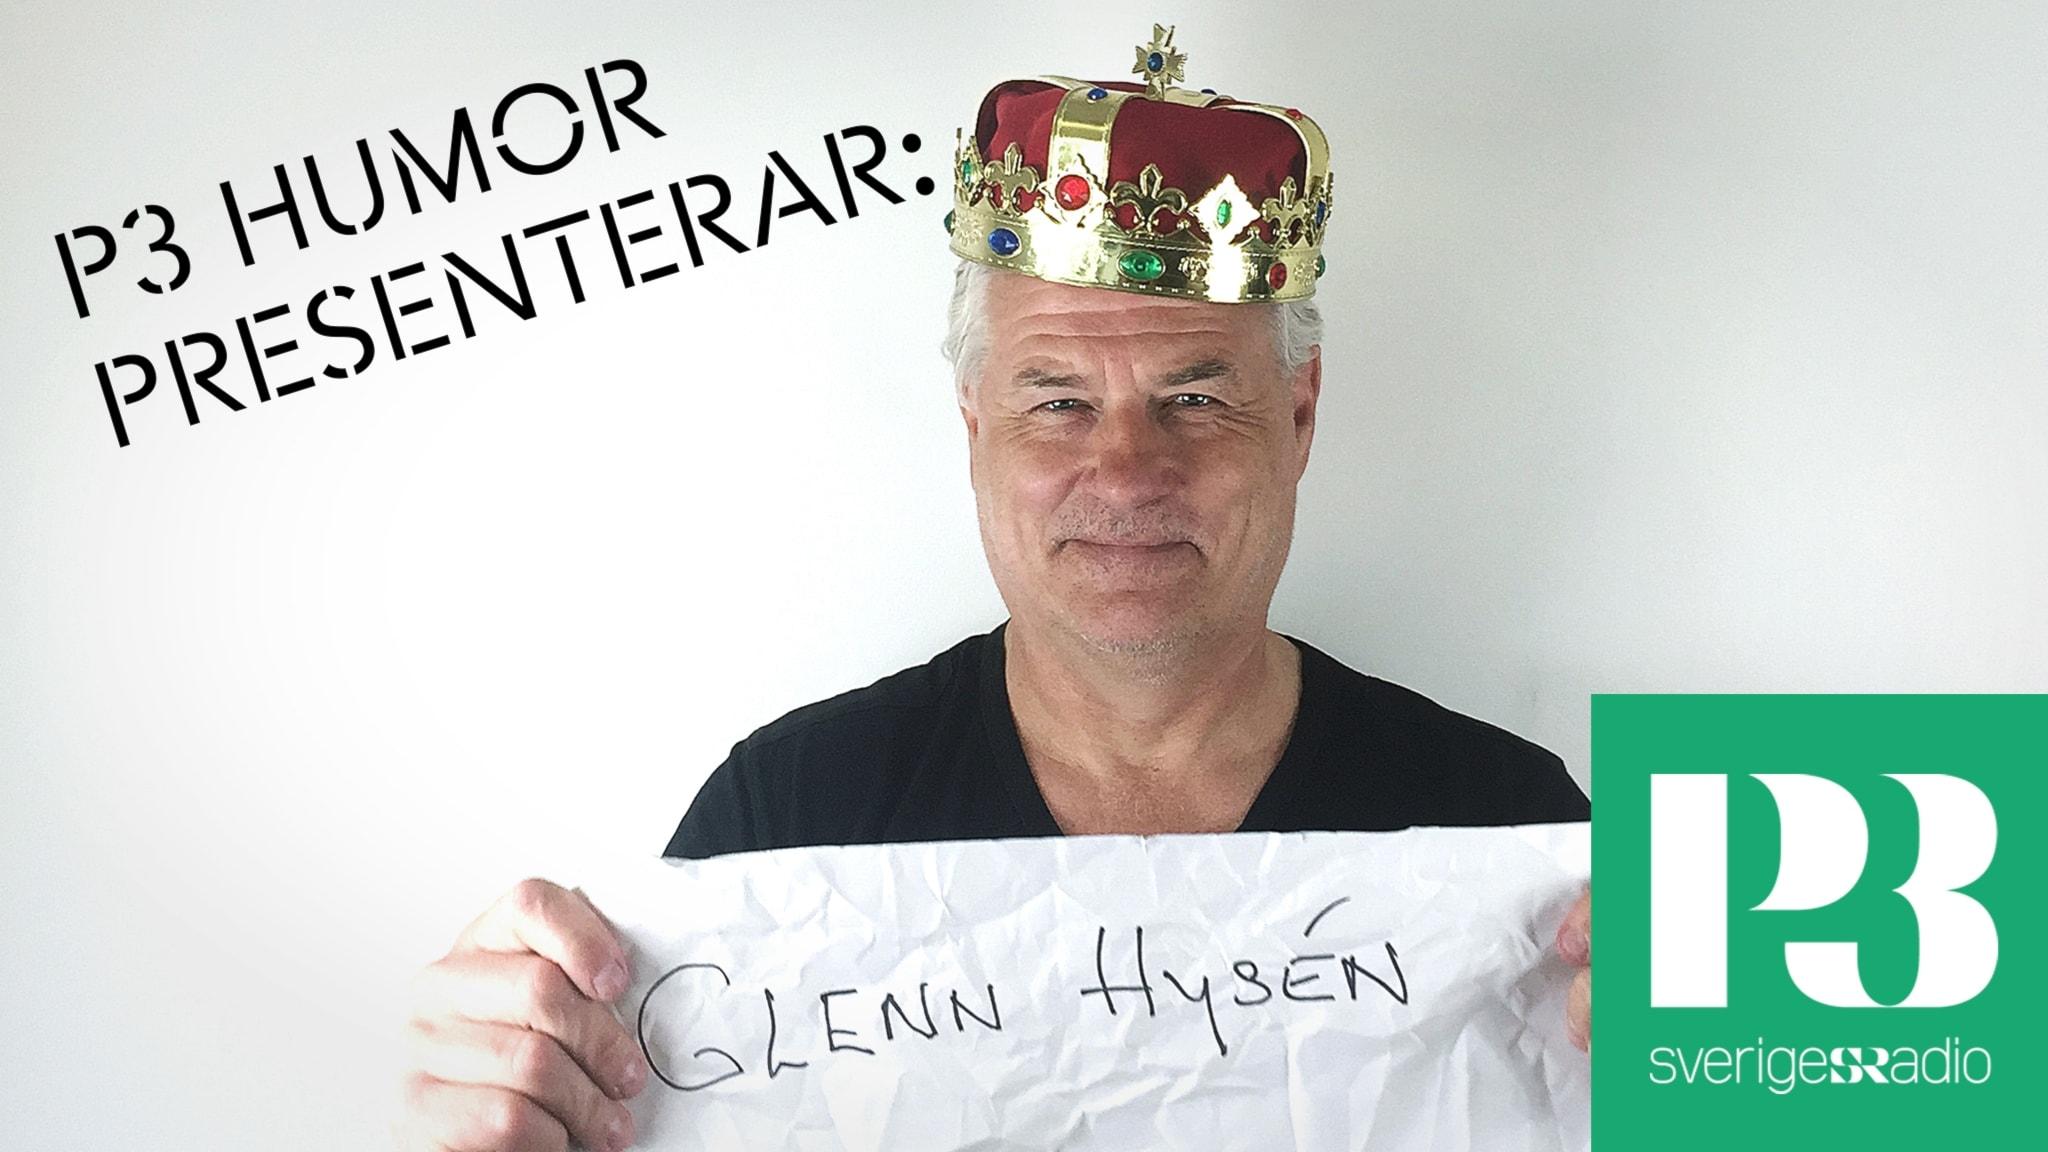 P3 Humor Presenterar: Glenn Hysén